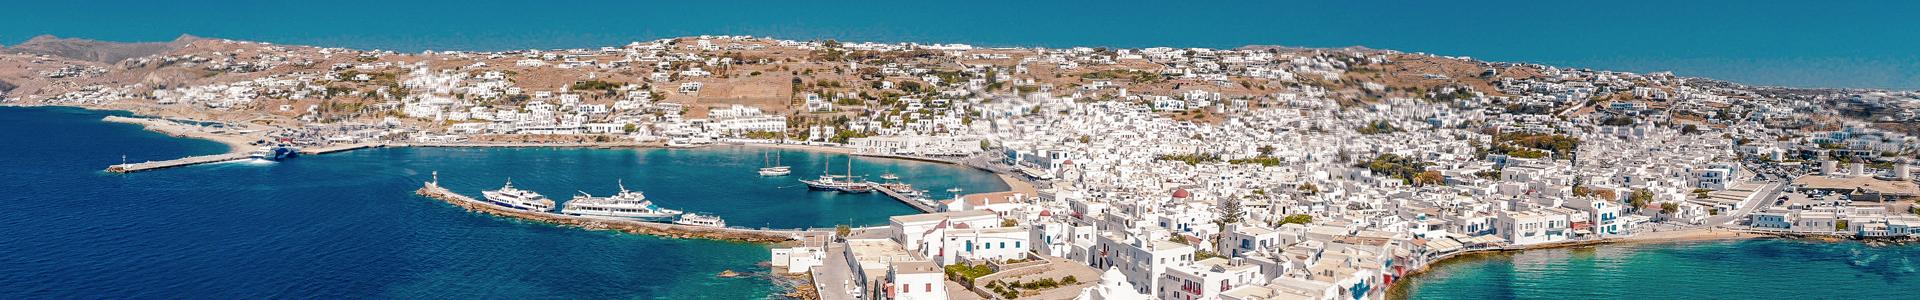 Island-Hopping-Andros-Tinos-Mykonos(HEADER)